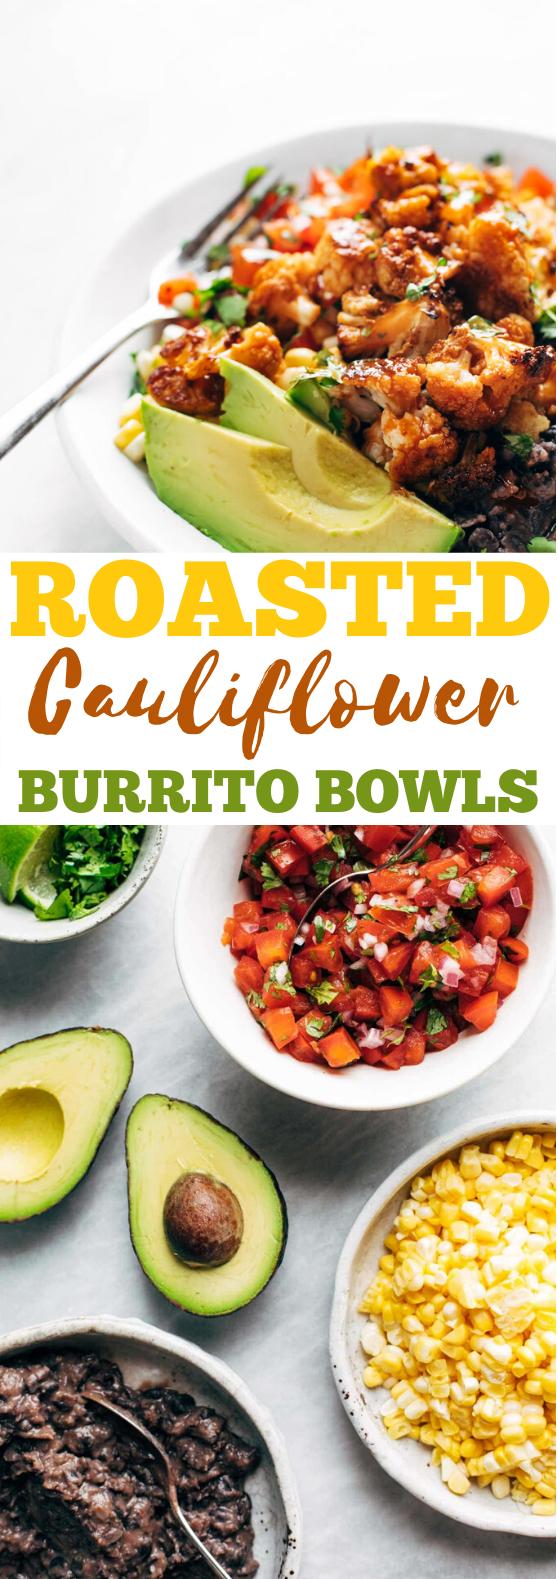 Roasted Cauliflower Burrito Bowls #vegetarian #healthy #dinner #plantbased #vegan